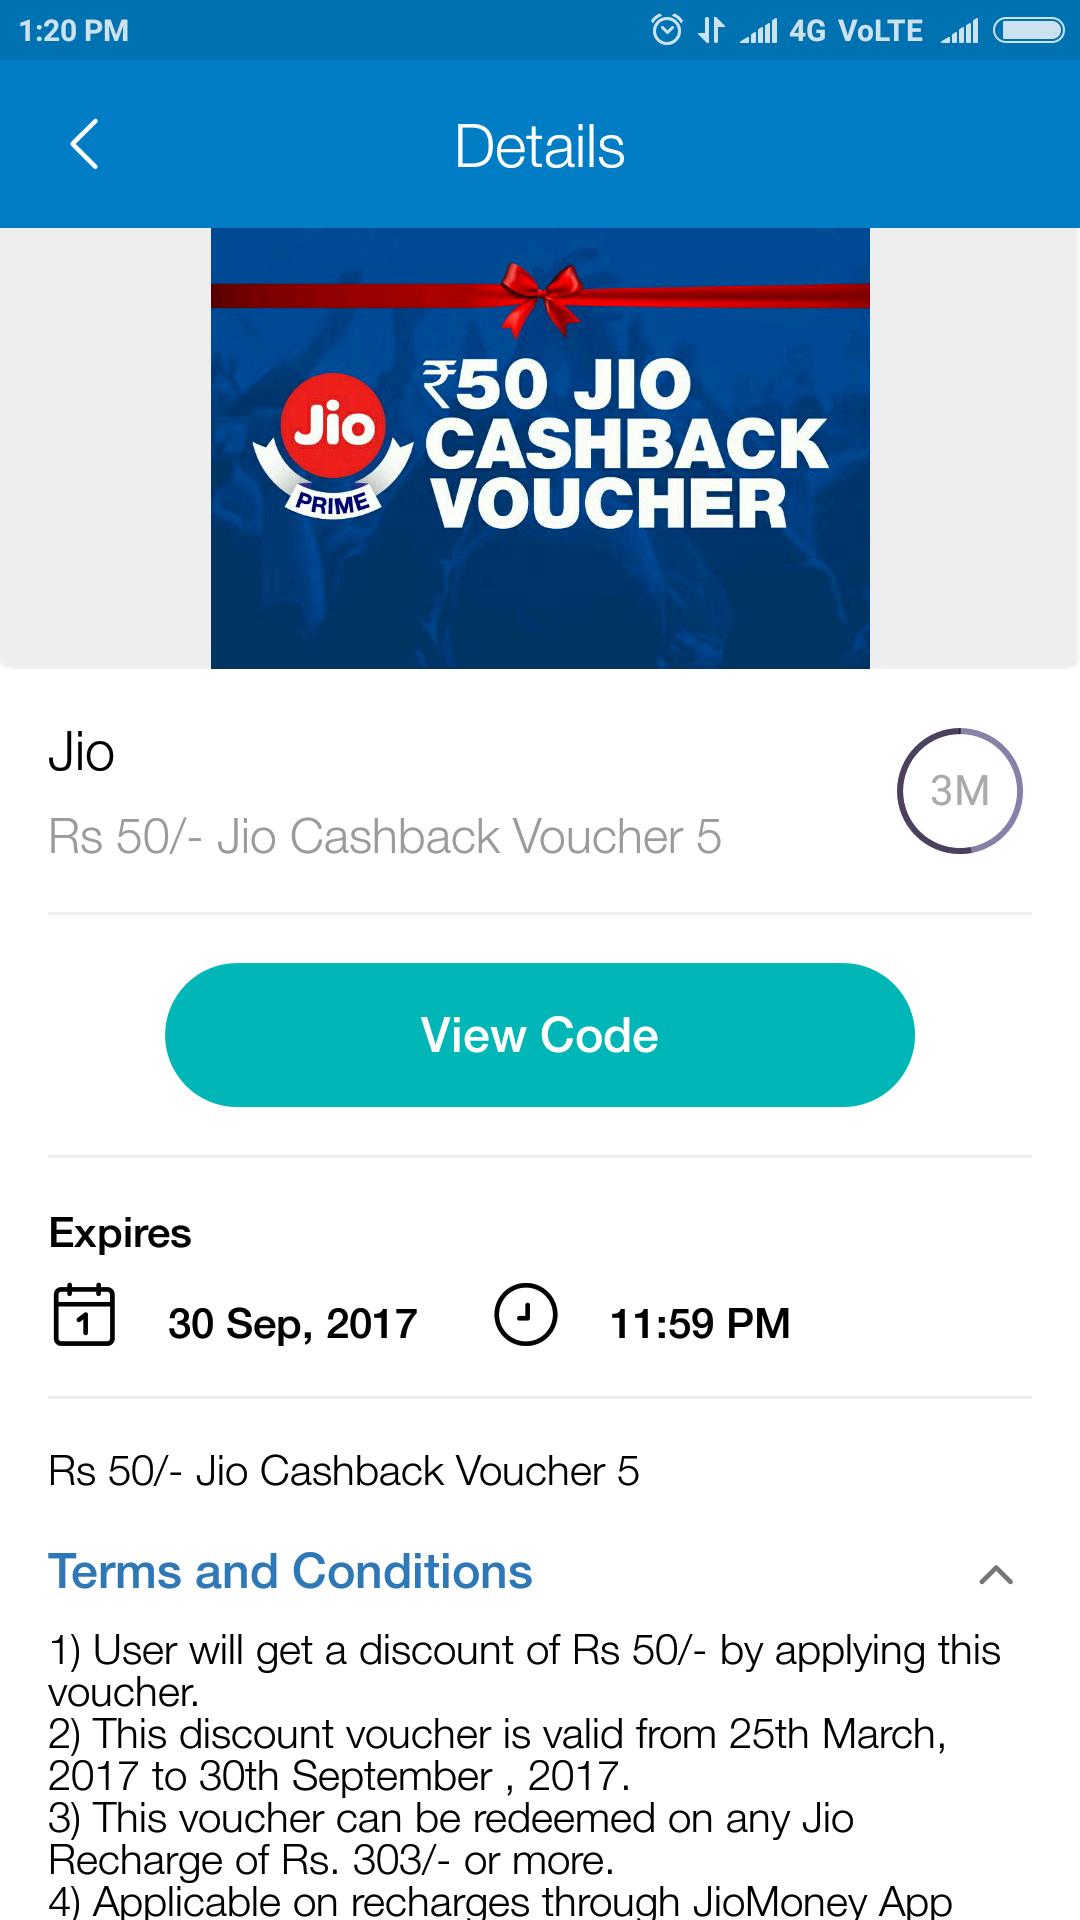 JioMoney Cashback Vouchers - Jio apps discussion - Reliance Jio